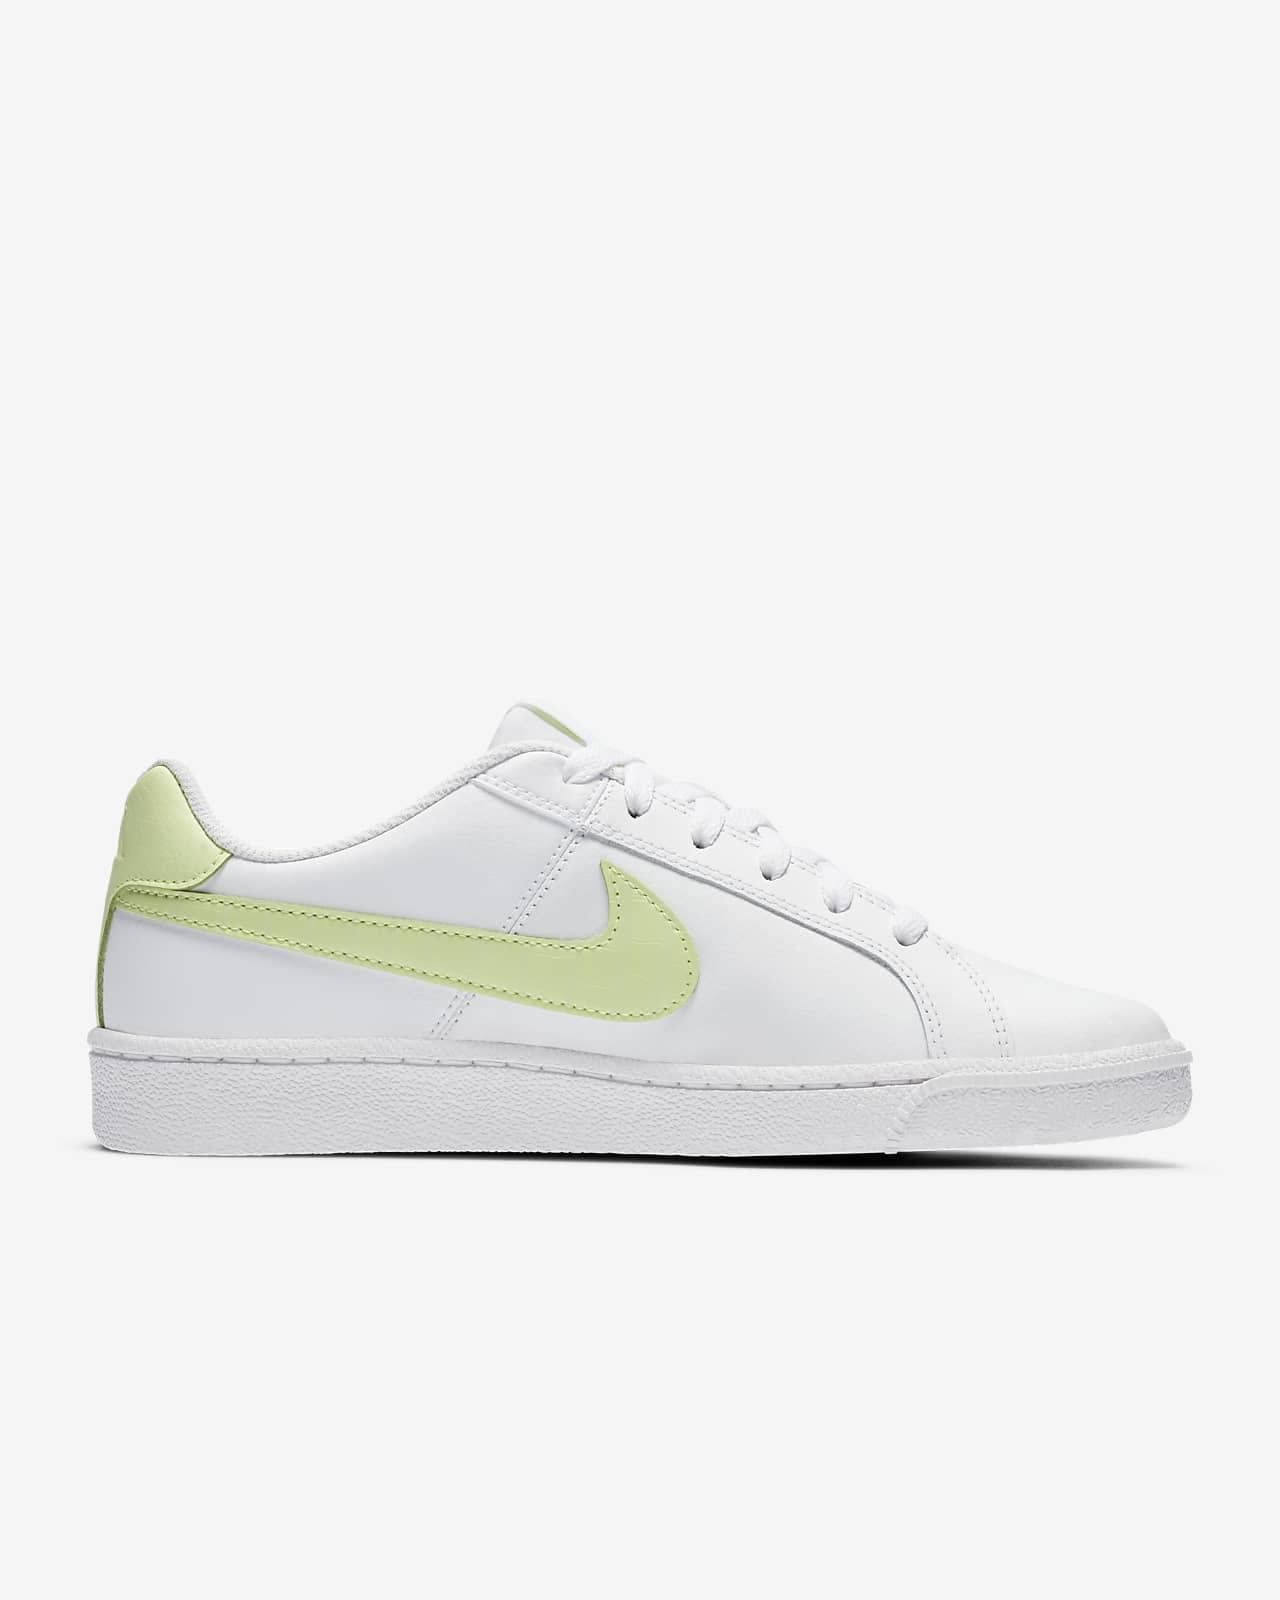 NikeCourt Royale Women's Shoe. Nike SG